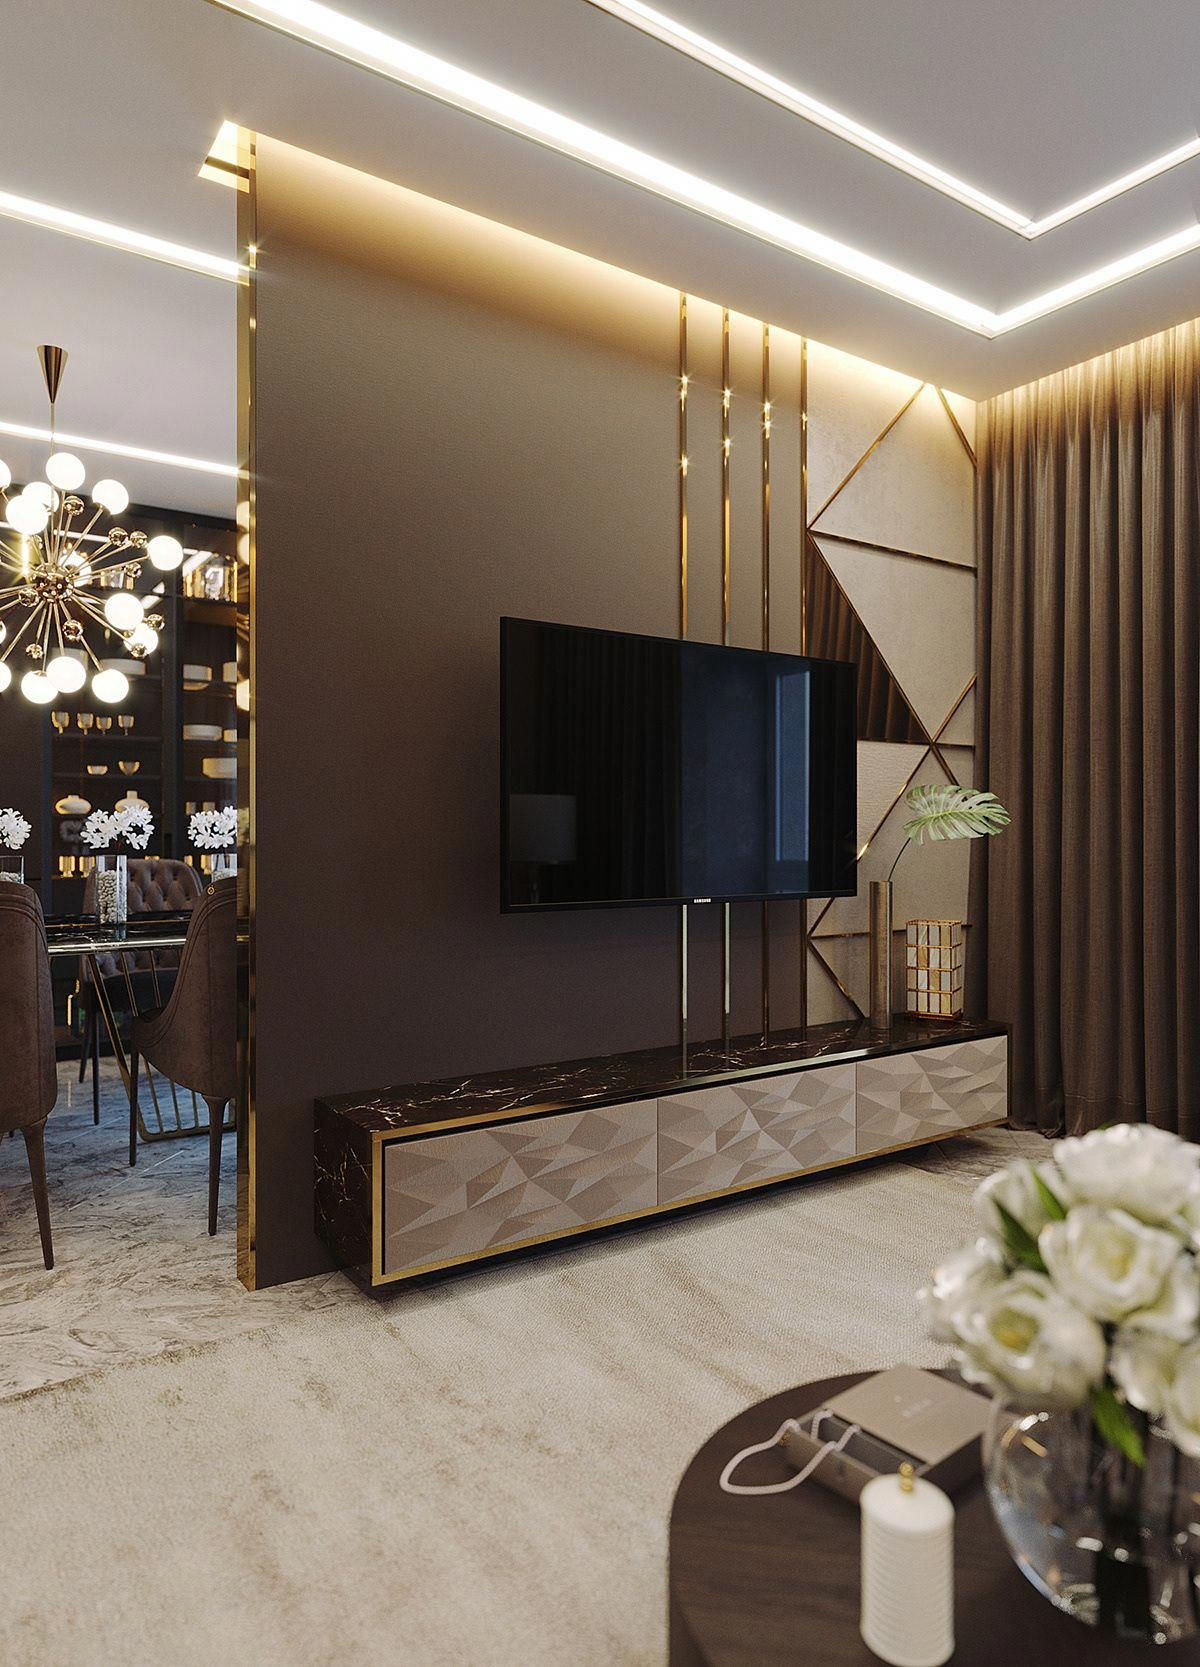 Living Room Interior Designs Tv Unit: Lovely Home Interior Wood #livingroomdesign